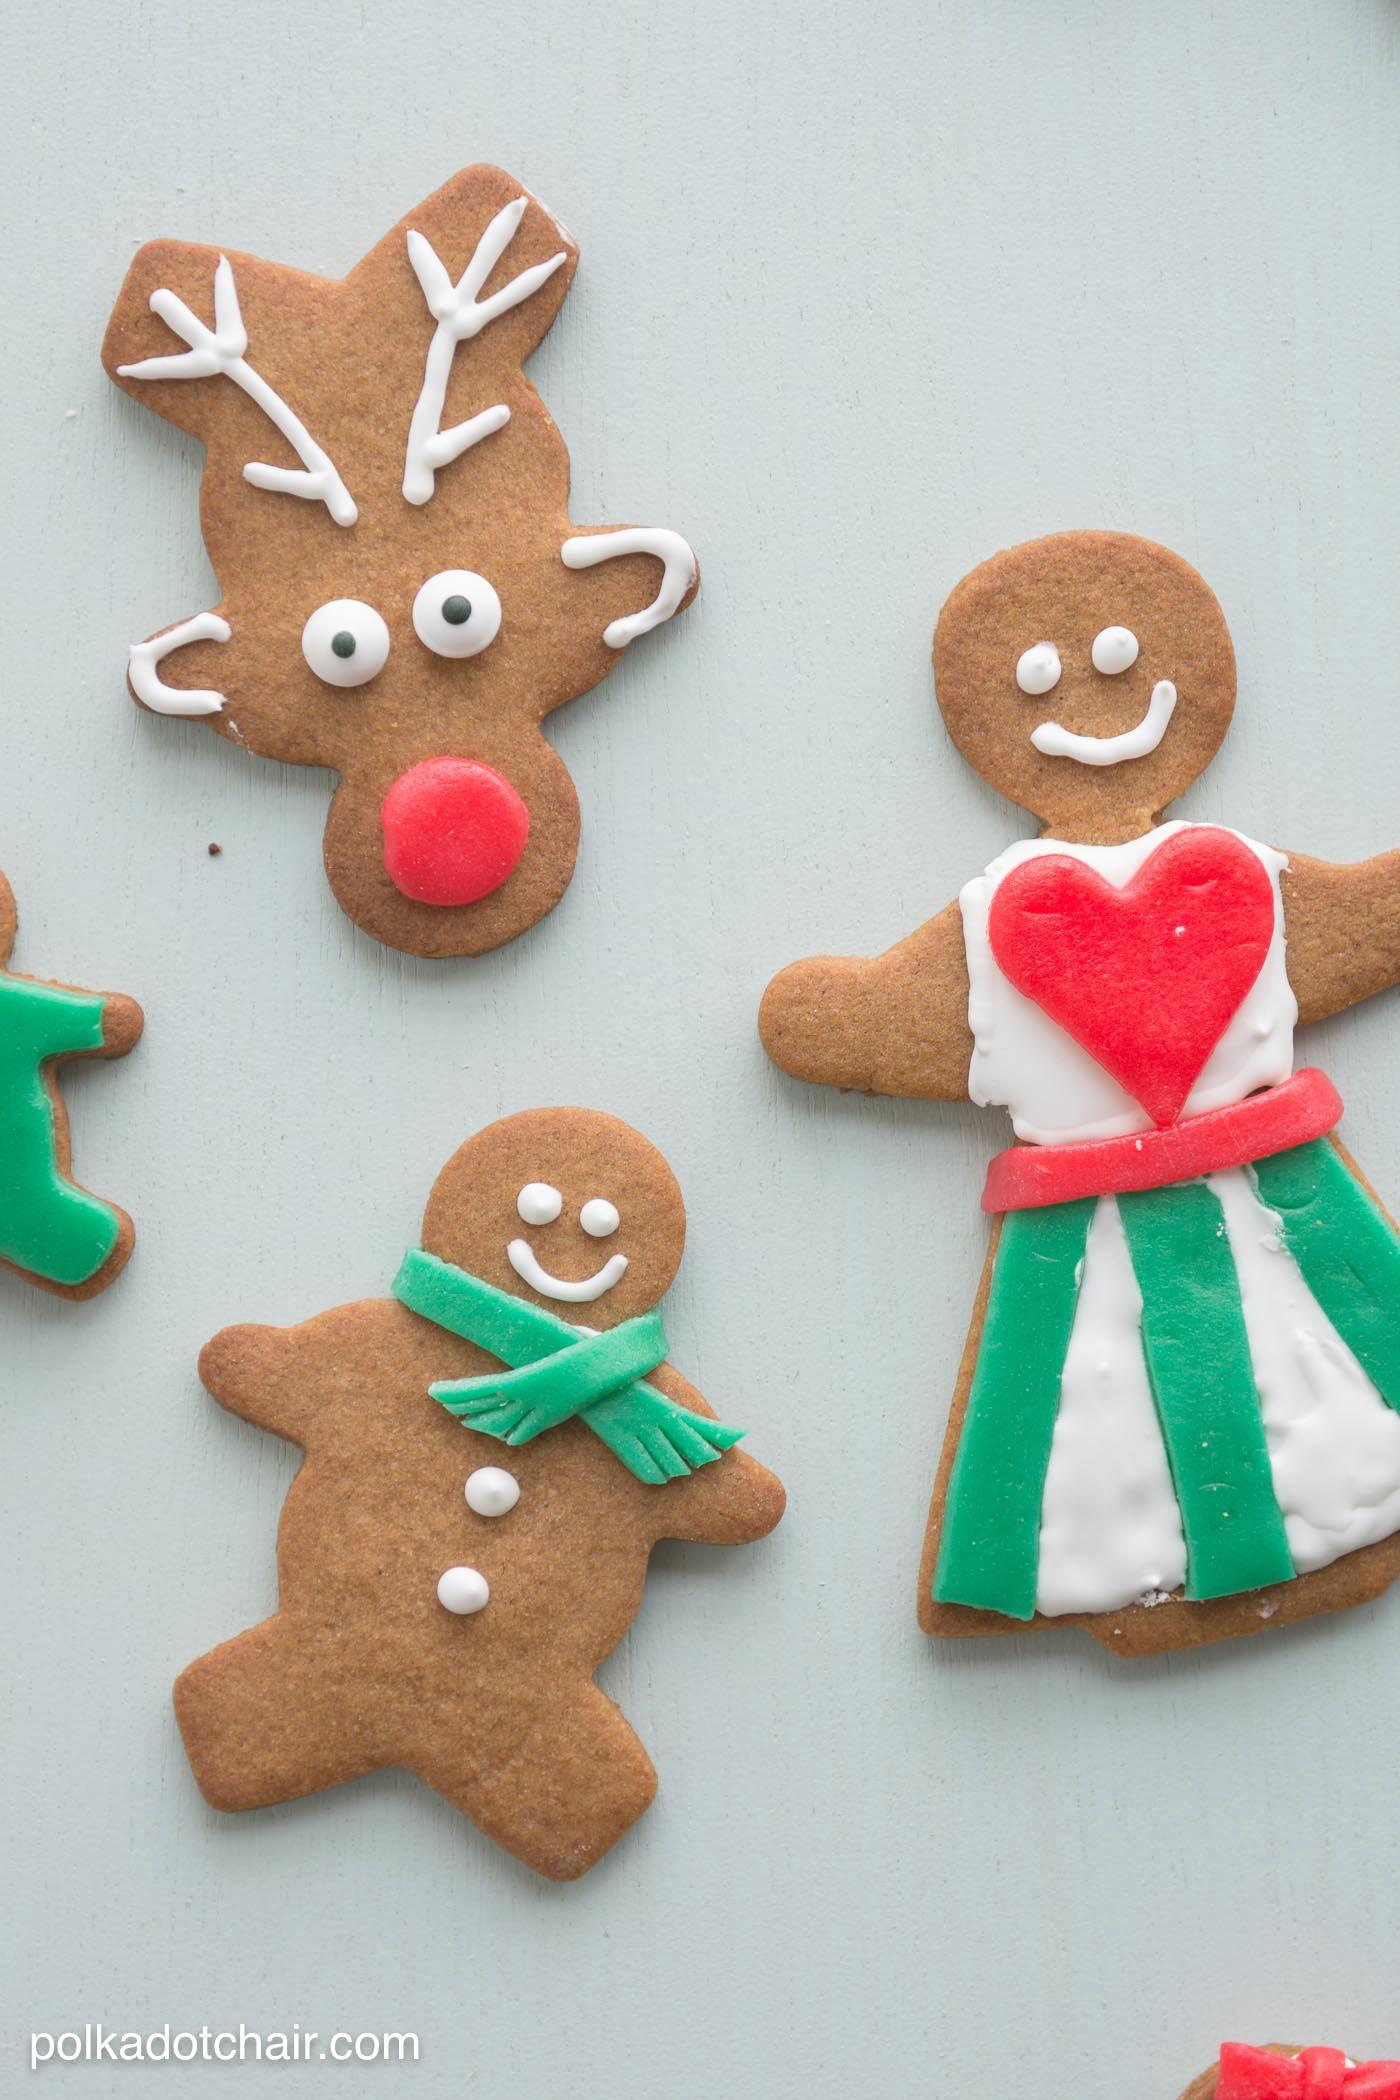 Gingerbread Cookie Decorating Ideas Gingerbread cookies